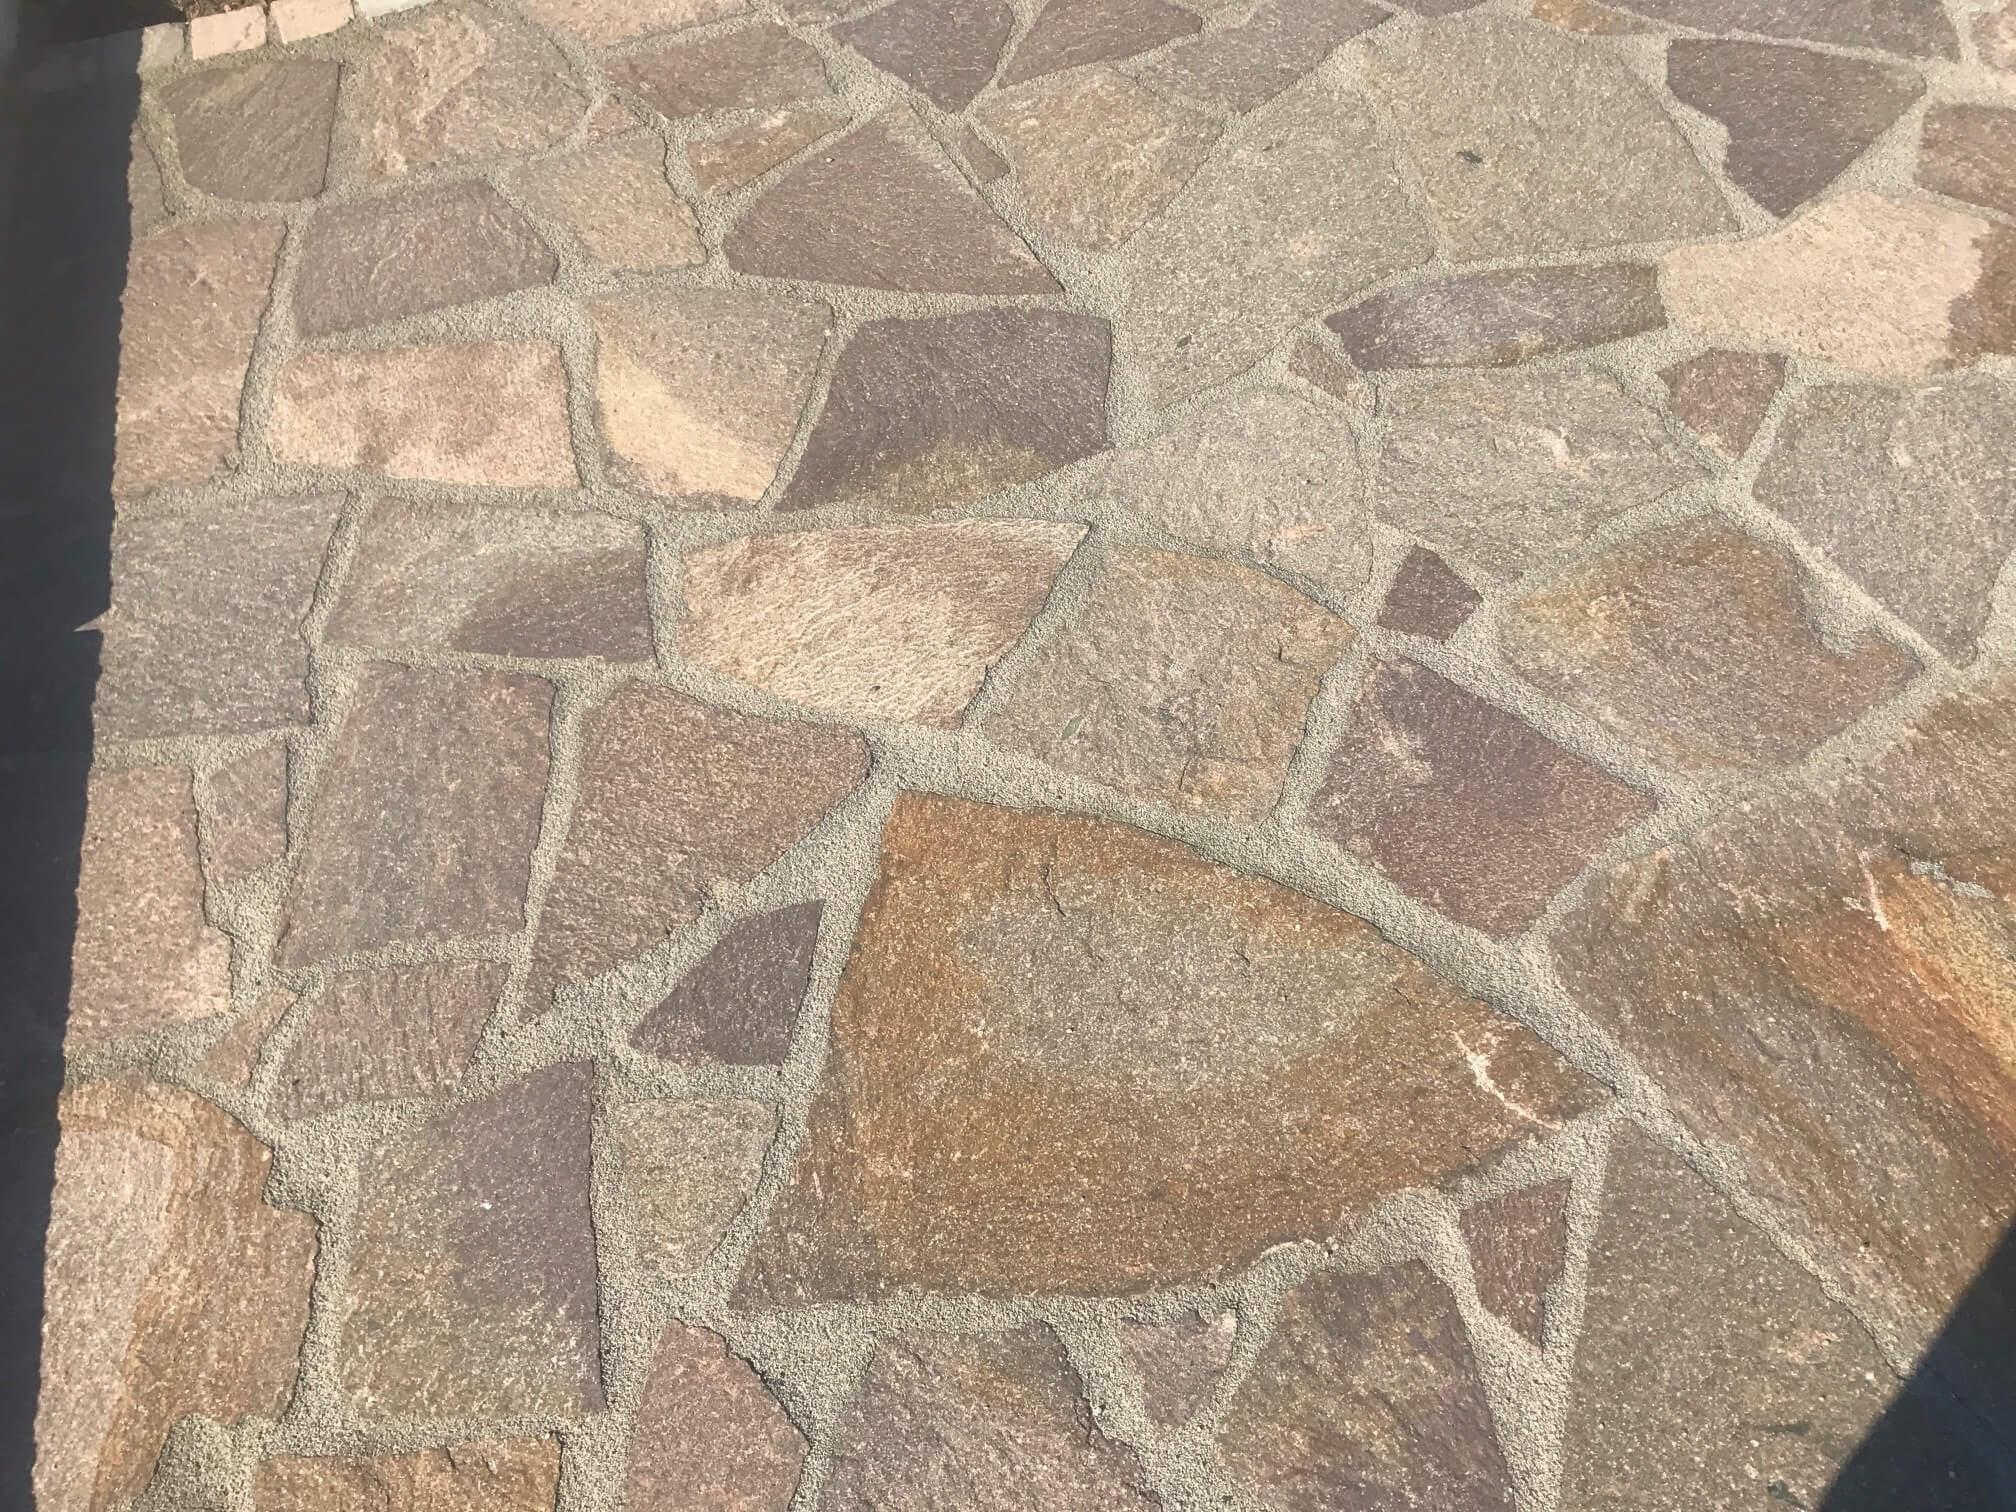 Porphyr Polygonalplatte rot-braun unregelmäßig gebrochen